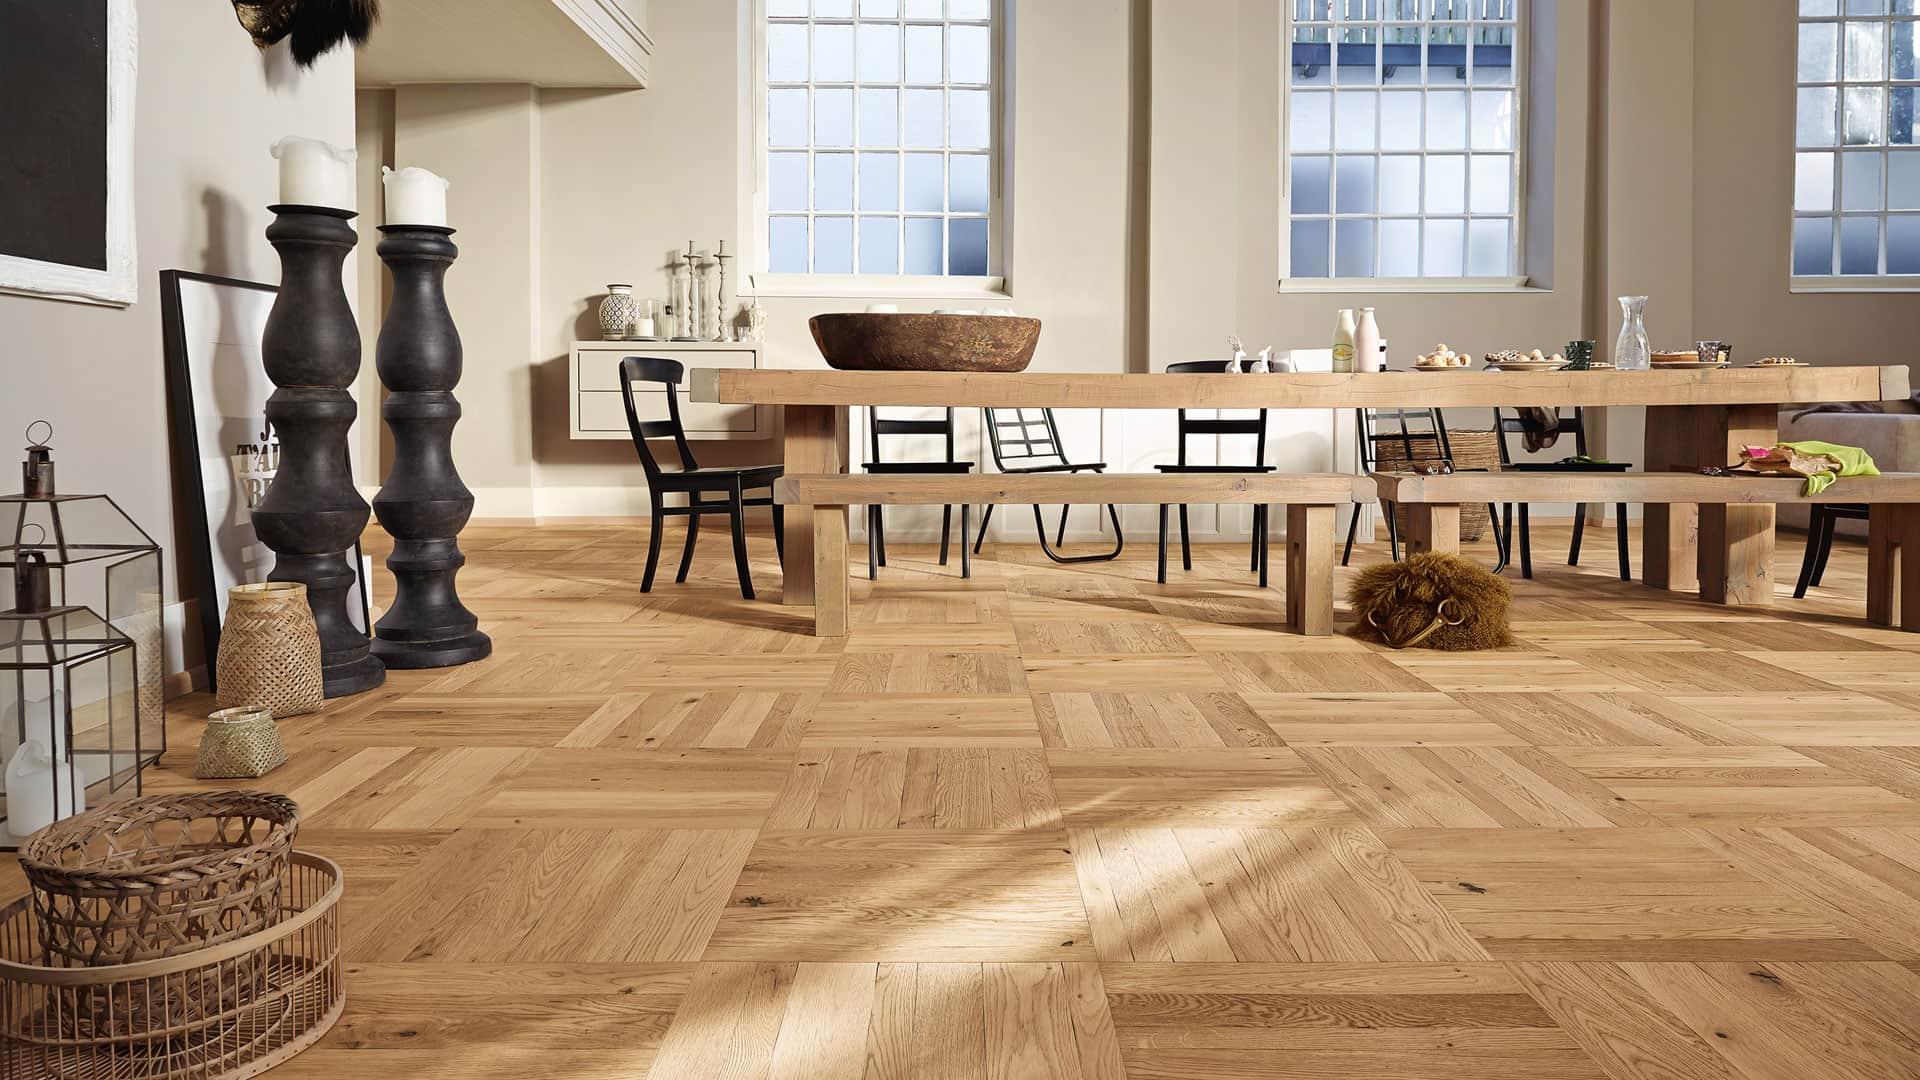 Parkettboden  Parkettboden – Holz im Original | Ratgeber Musterhaus.net